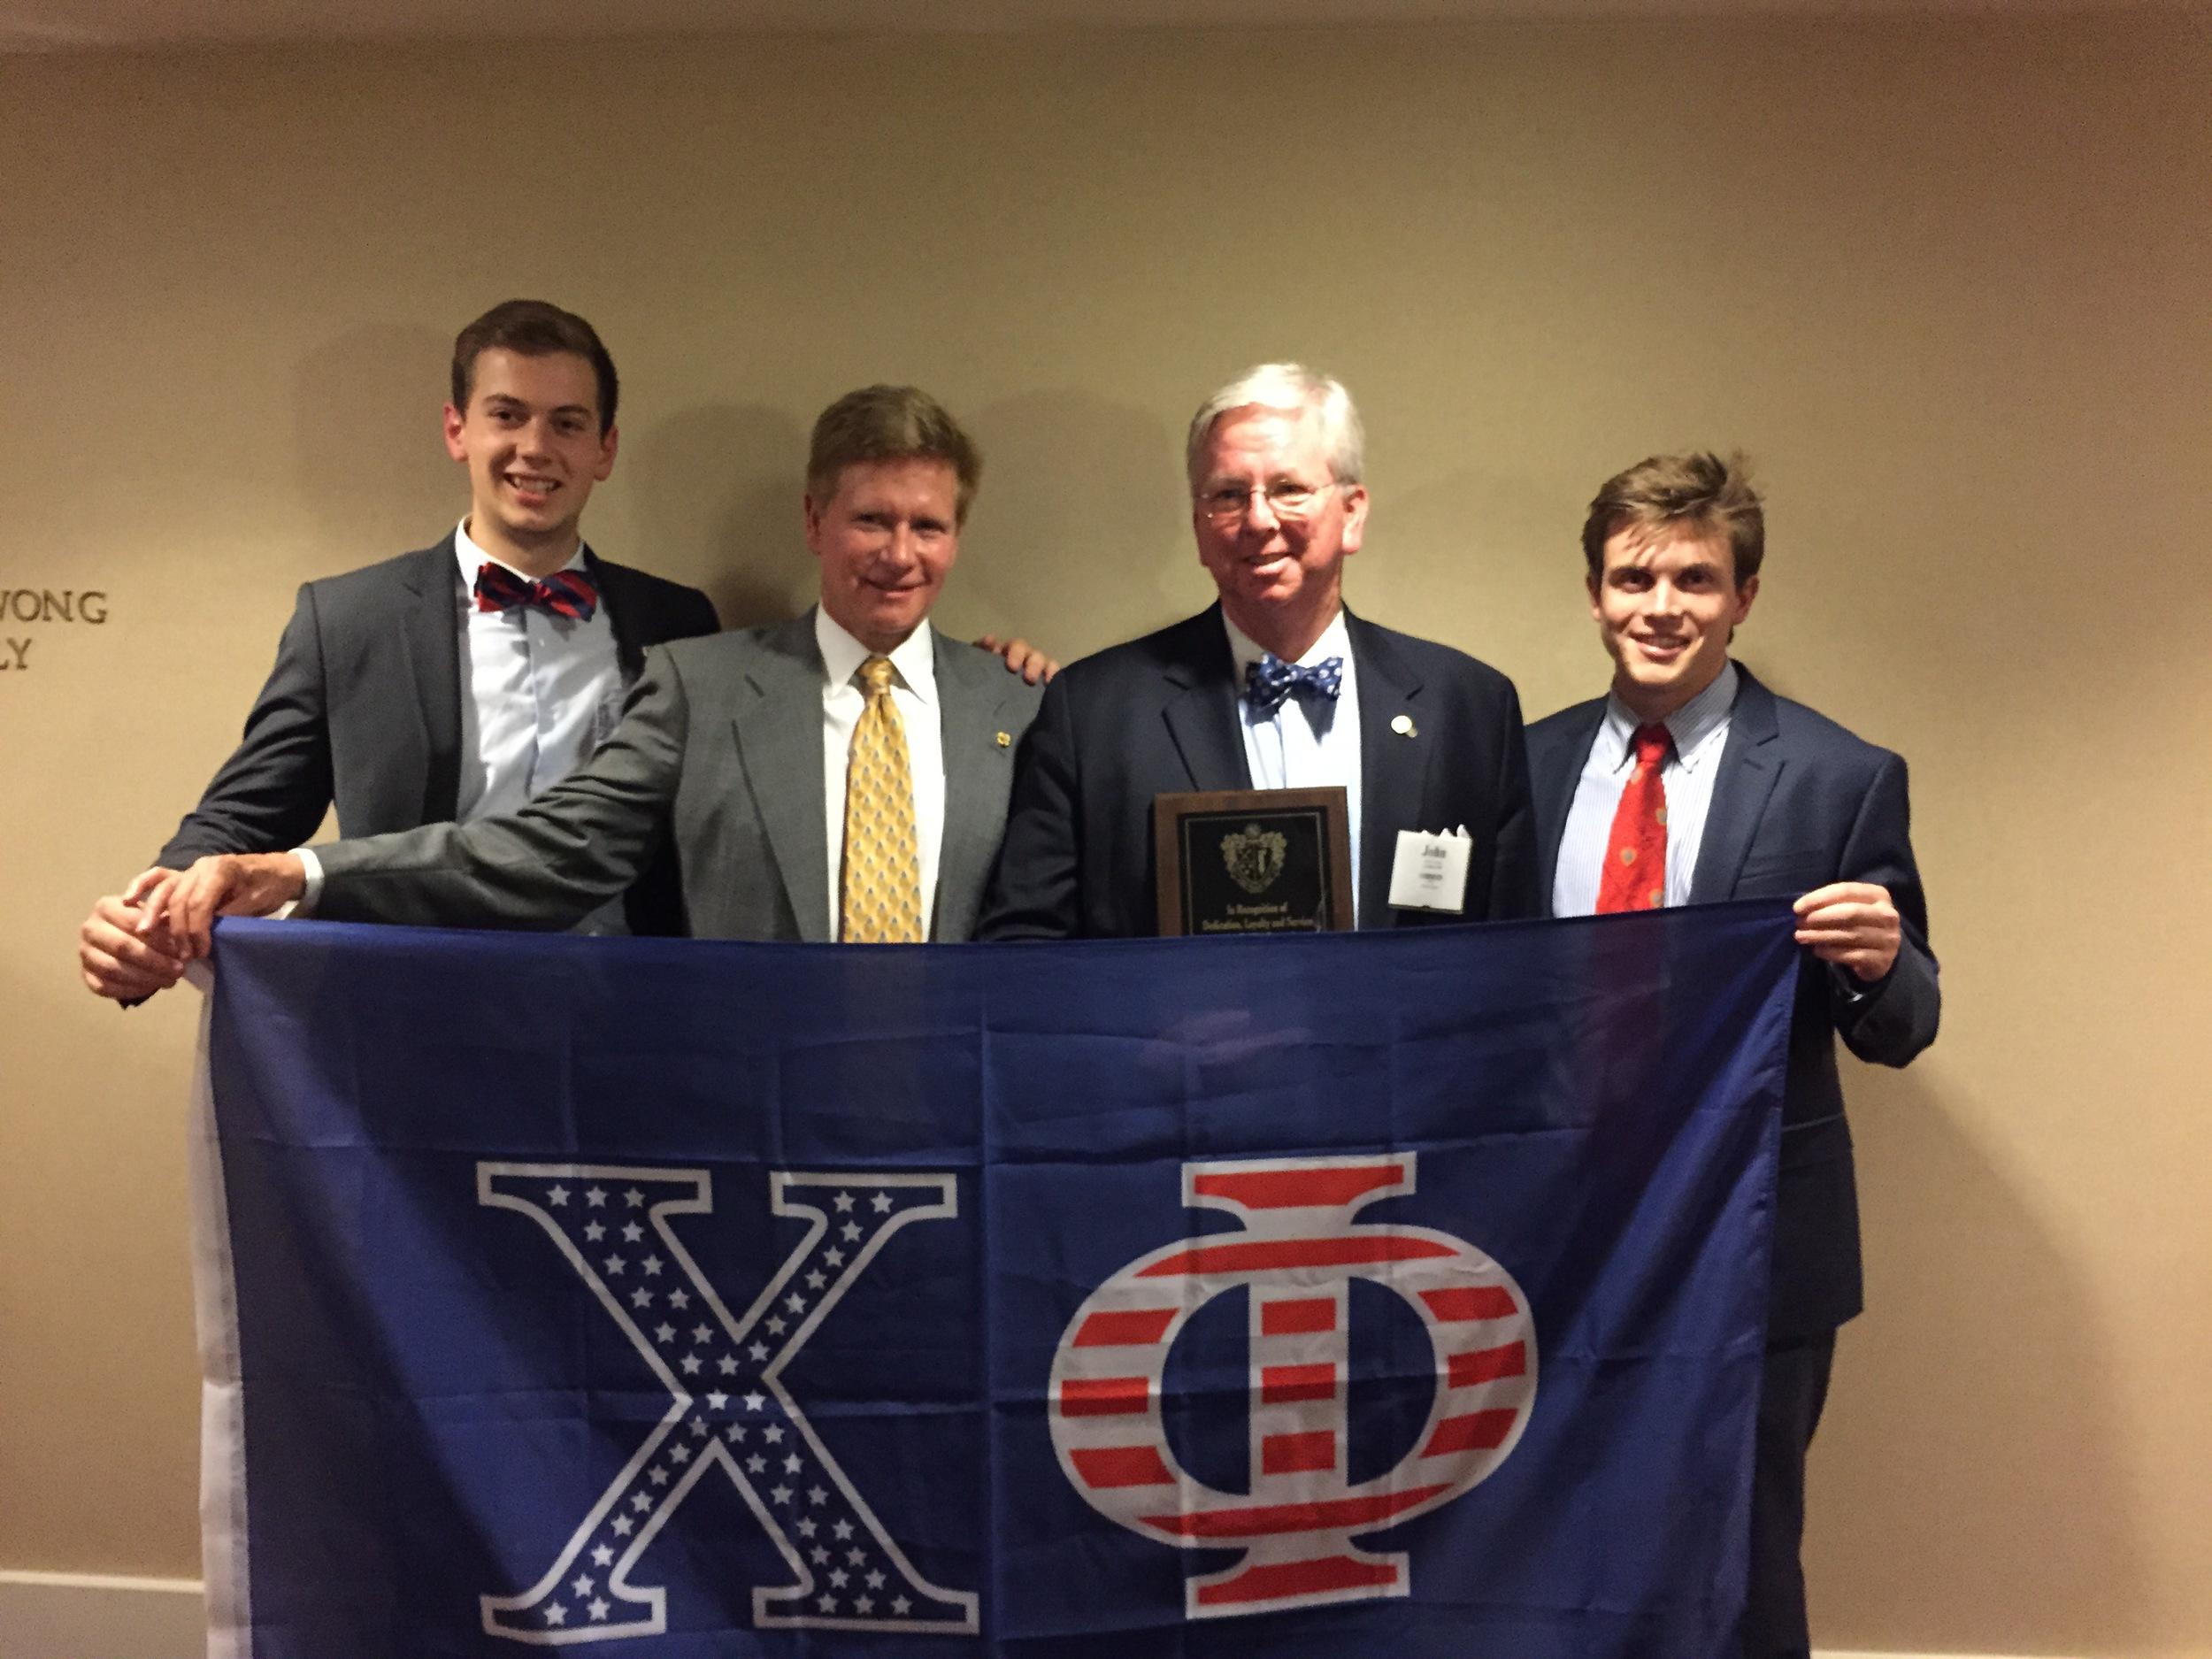 From left to right: Robert Purviance, Bob FInley, John Christian, Trevor Dowds.